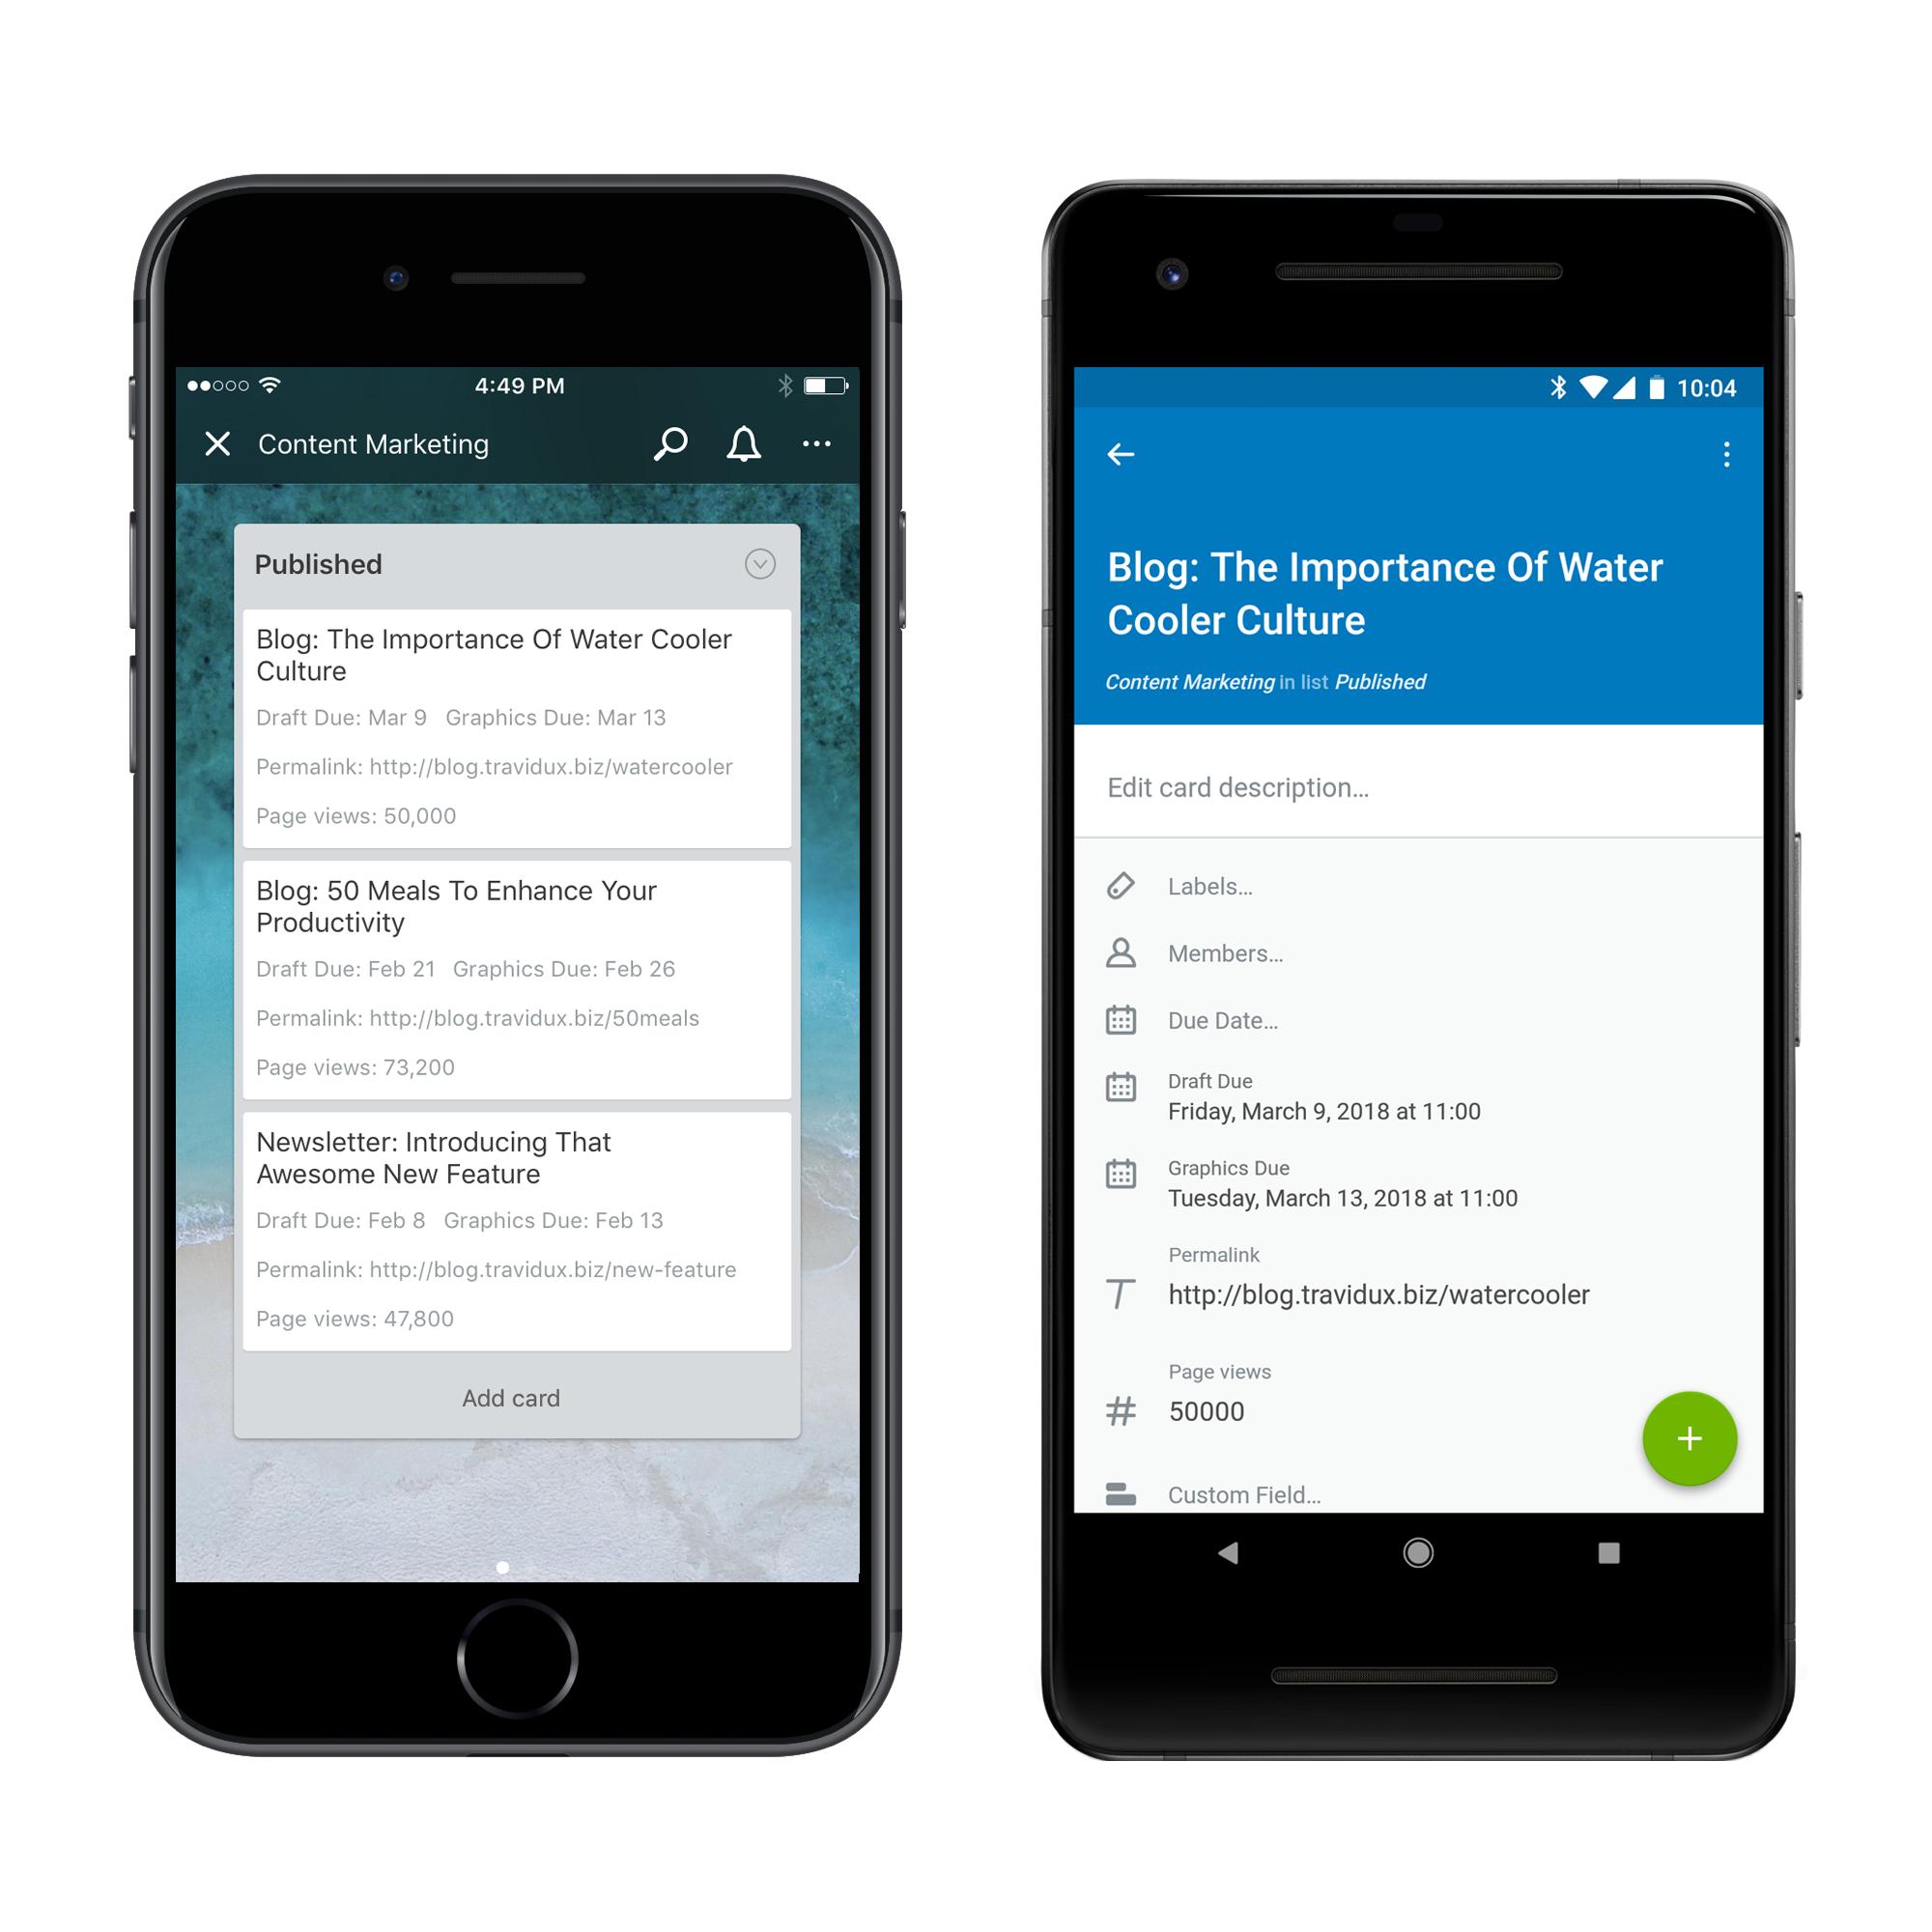 Trello benutzerdefinierte-Felder-iOS-Android